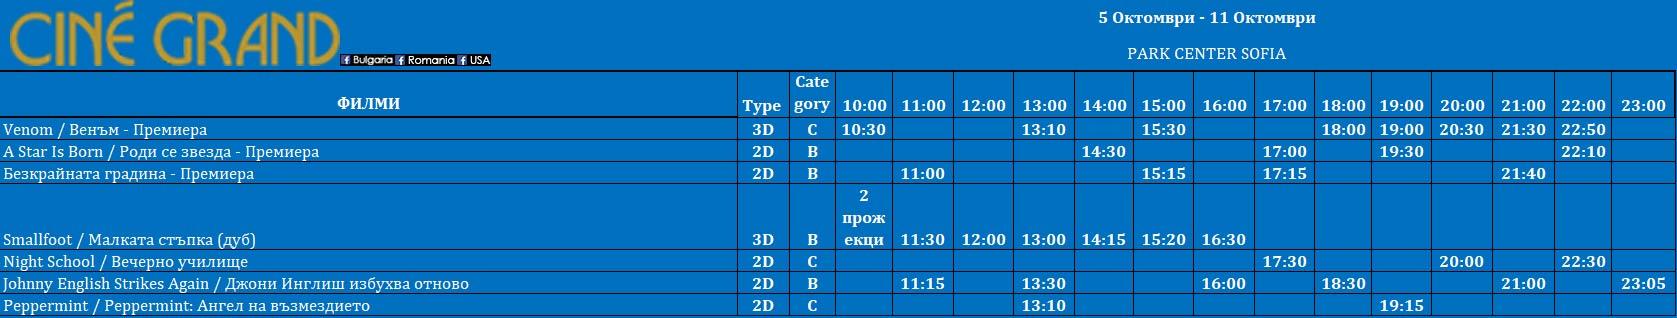 Кино програма на Cine Grand Park Center Sofia за периода 05 октомври – 11 октомври 2018г.